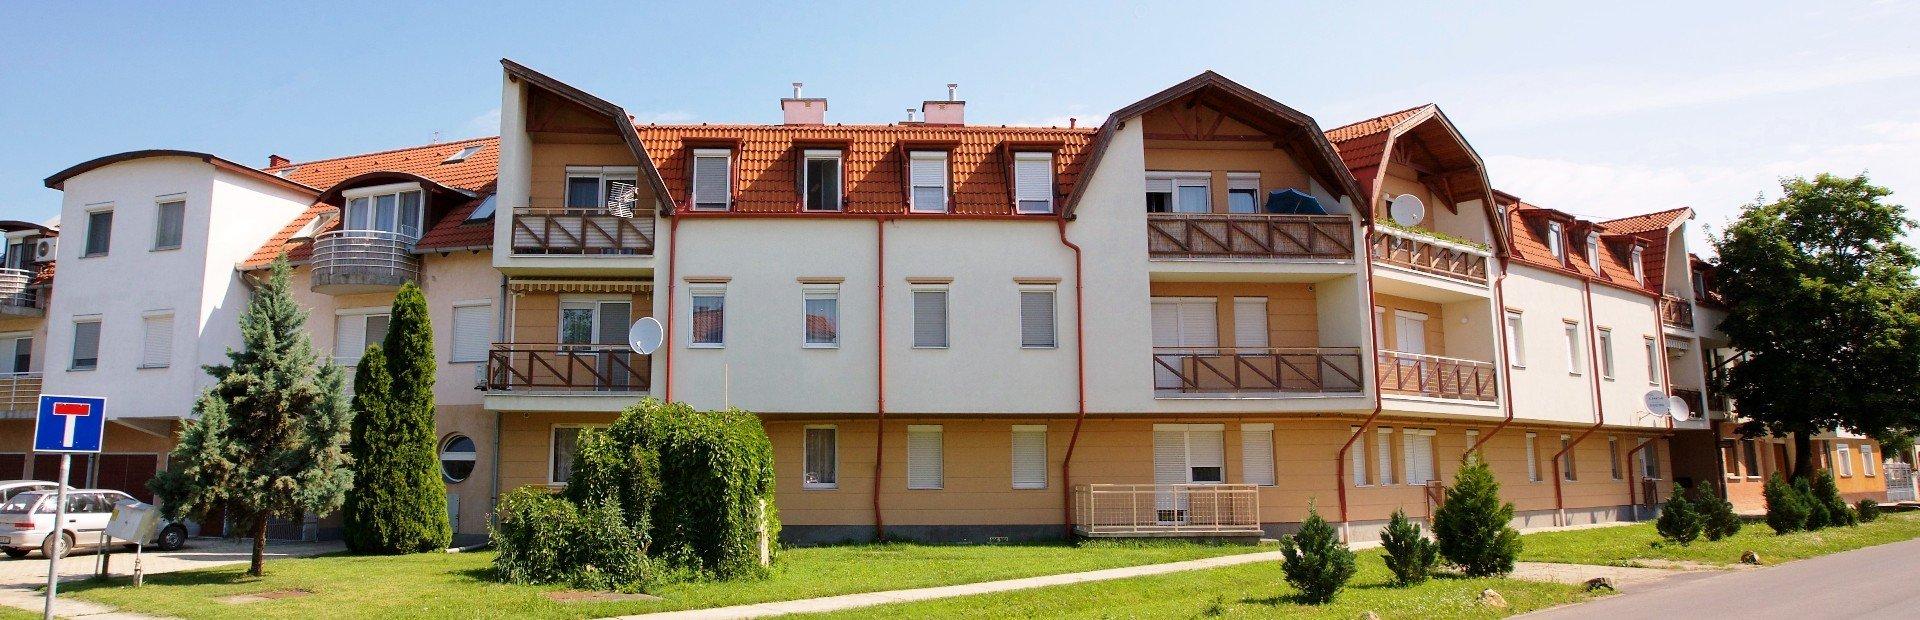 Zoli Apartmanok | Hajdúszoboszló – stațiunea pentru recreere